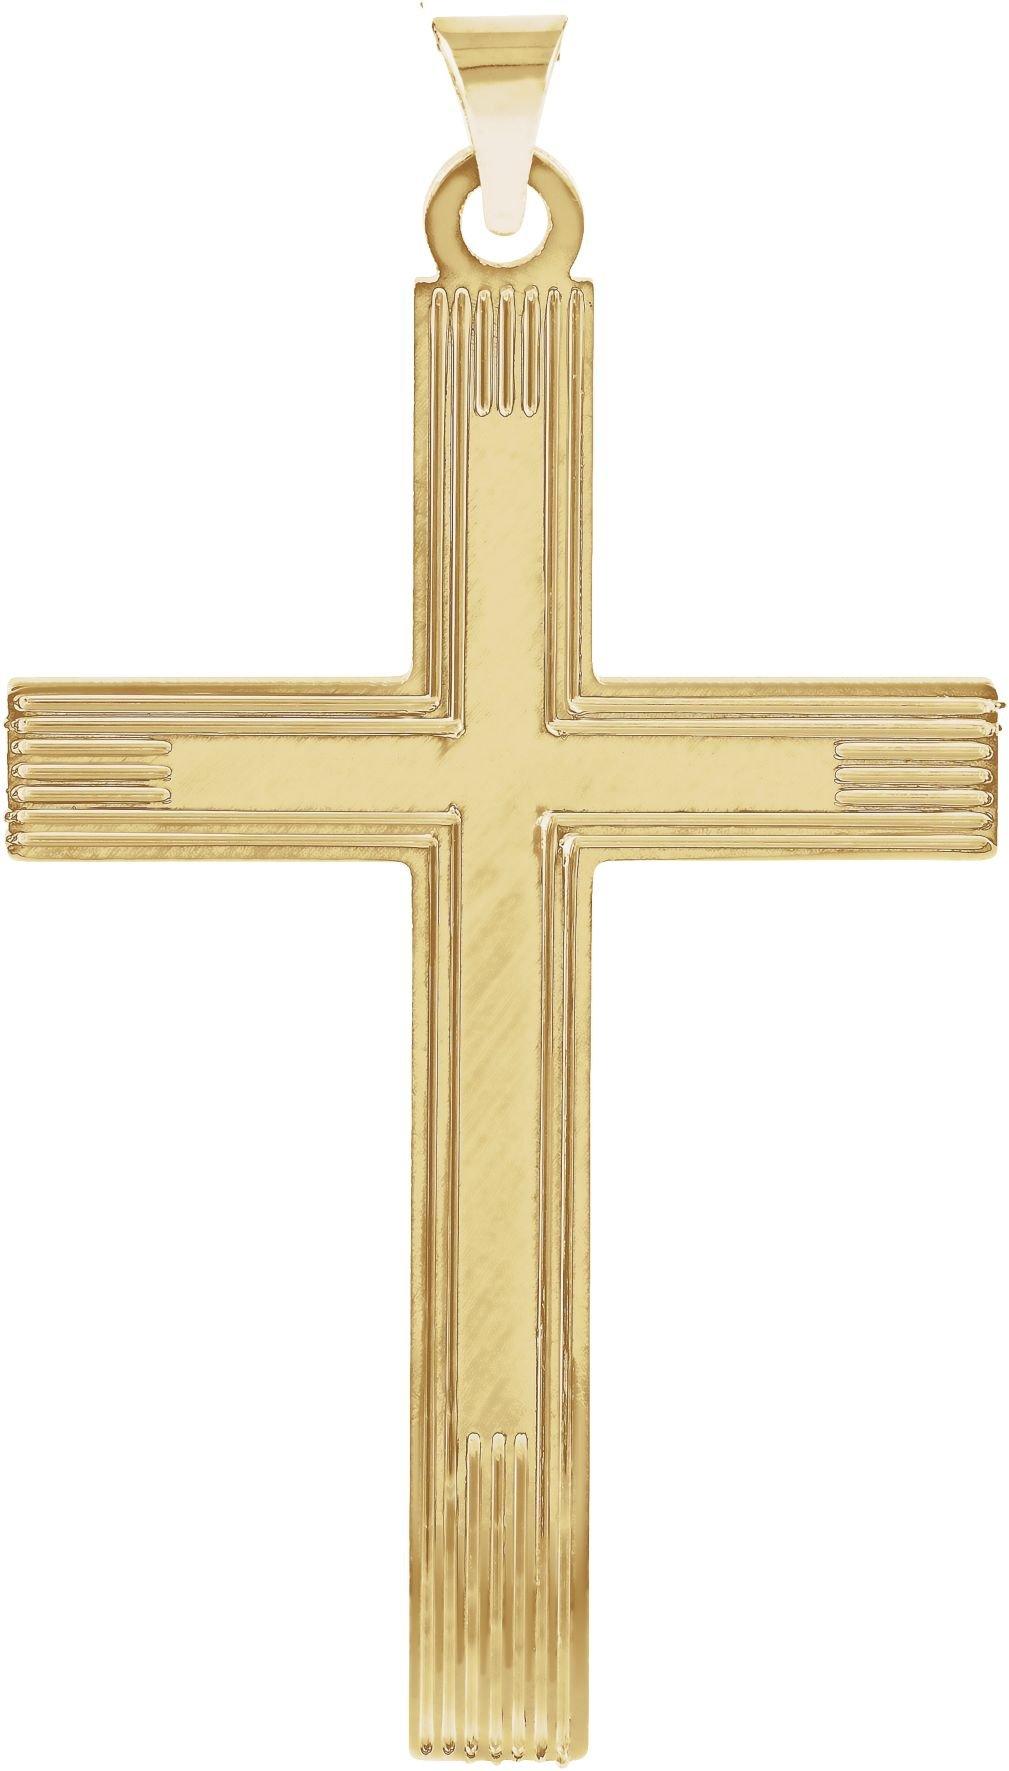 Cross with Embossed Cross Inside the Cross 14k Yellow Gold Pendant